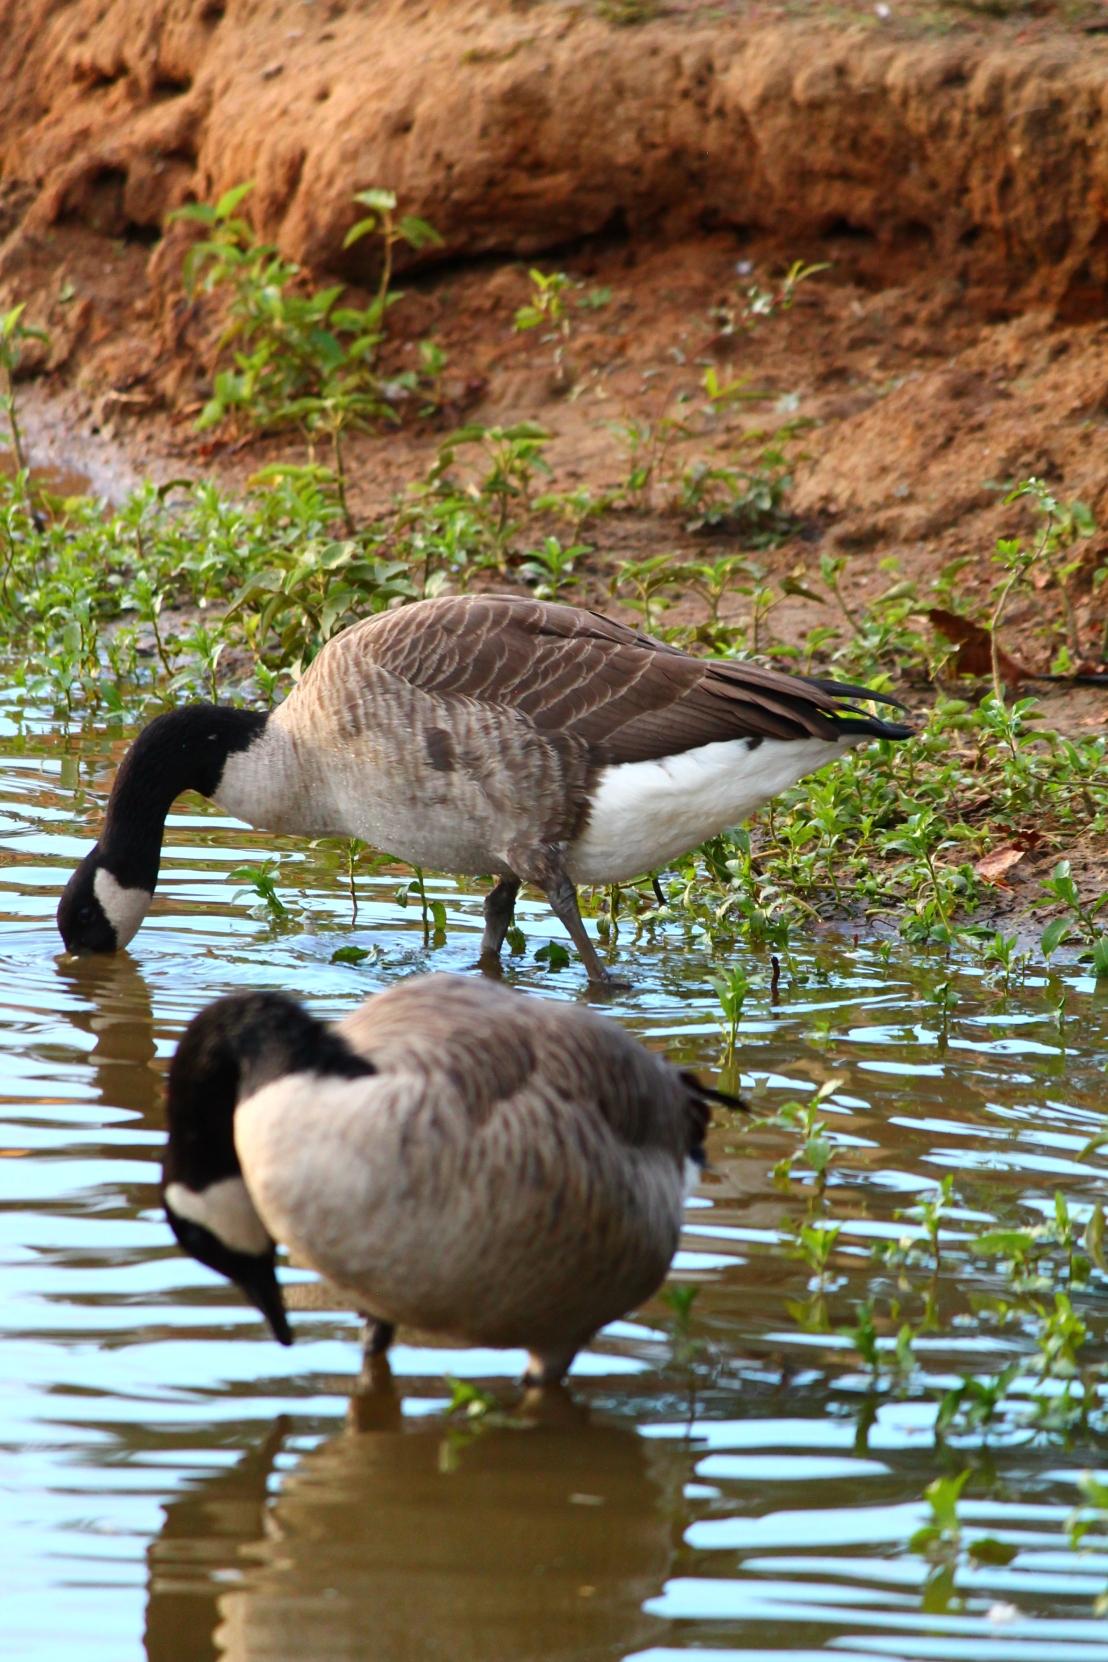 The Feeding Geese